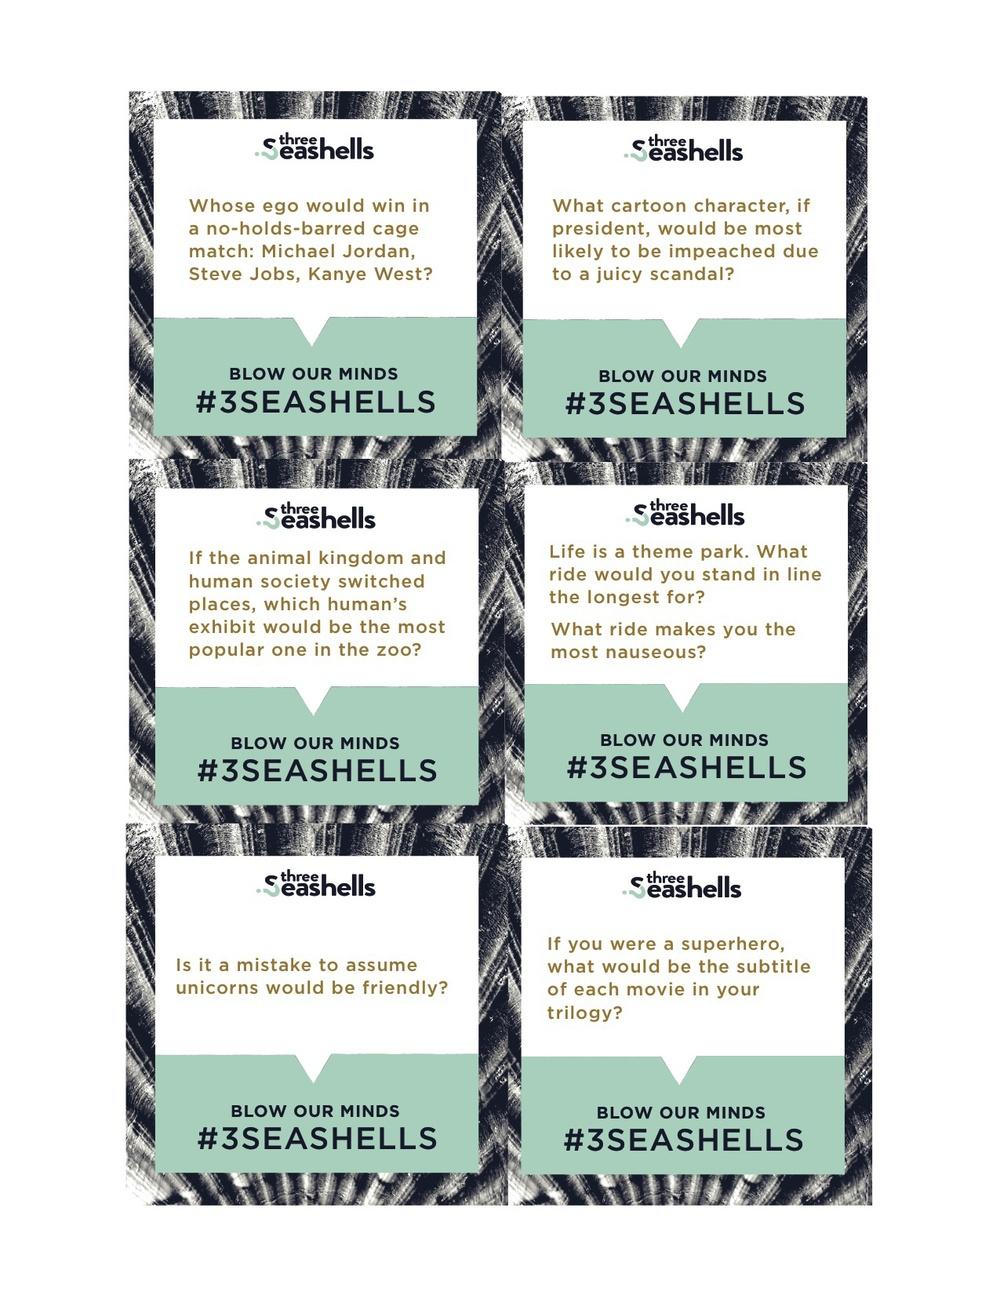 3seashells-2.jpg